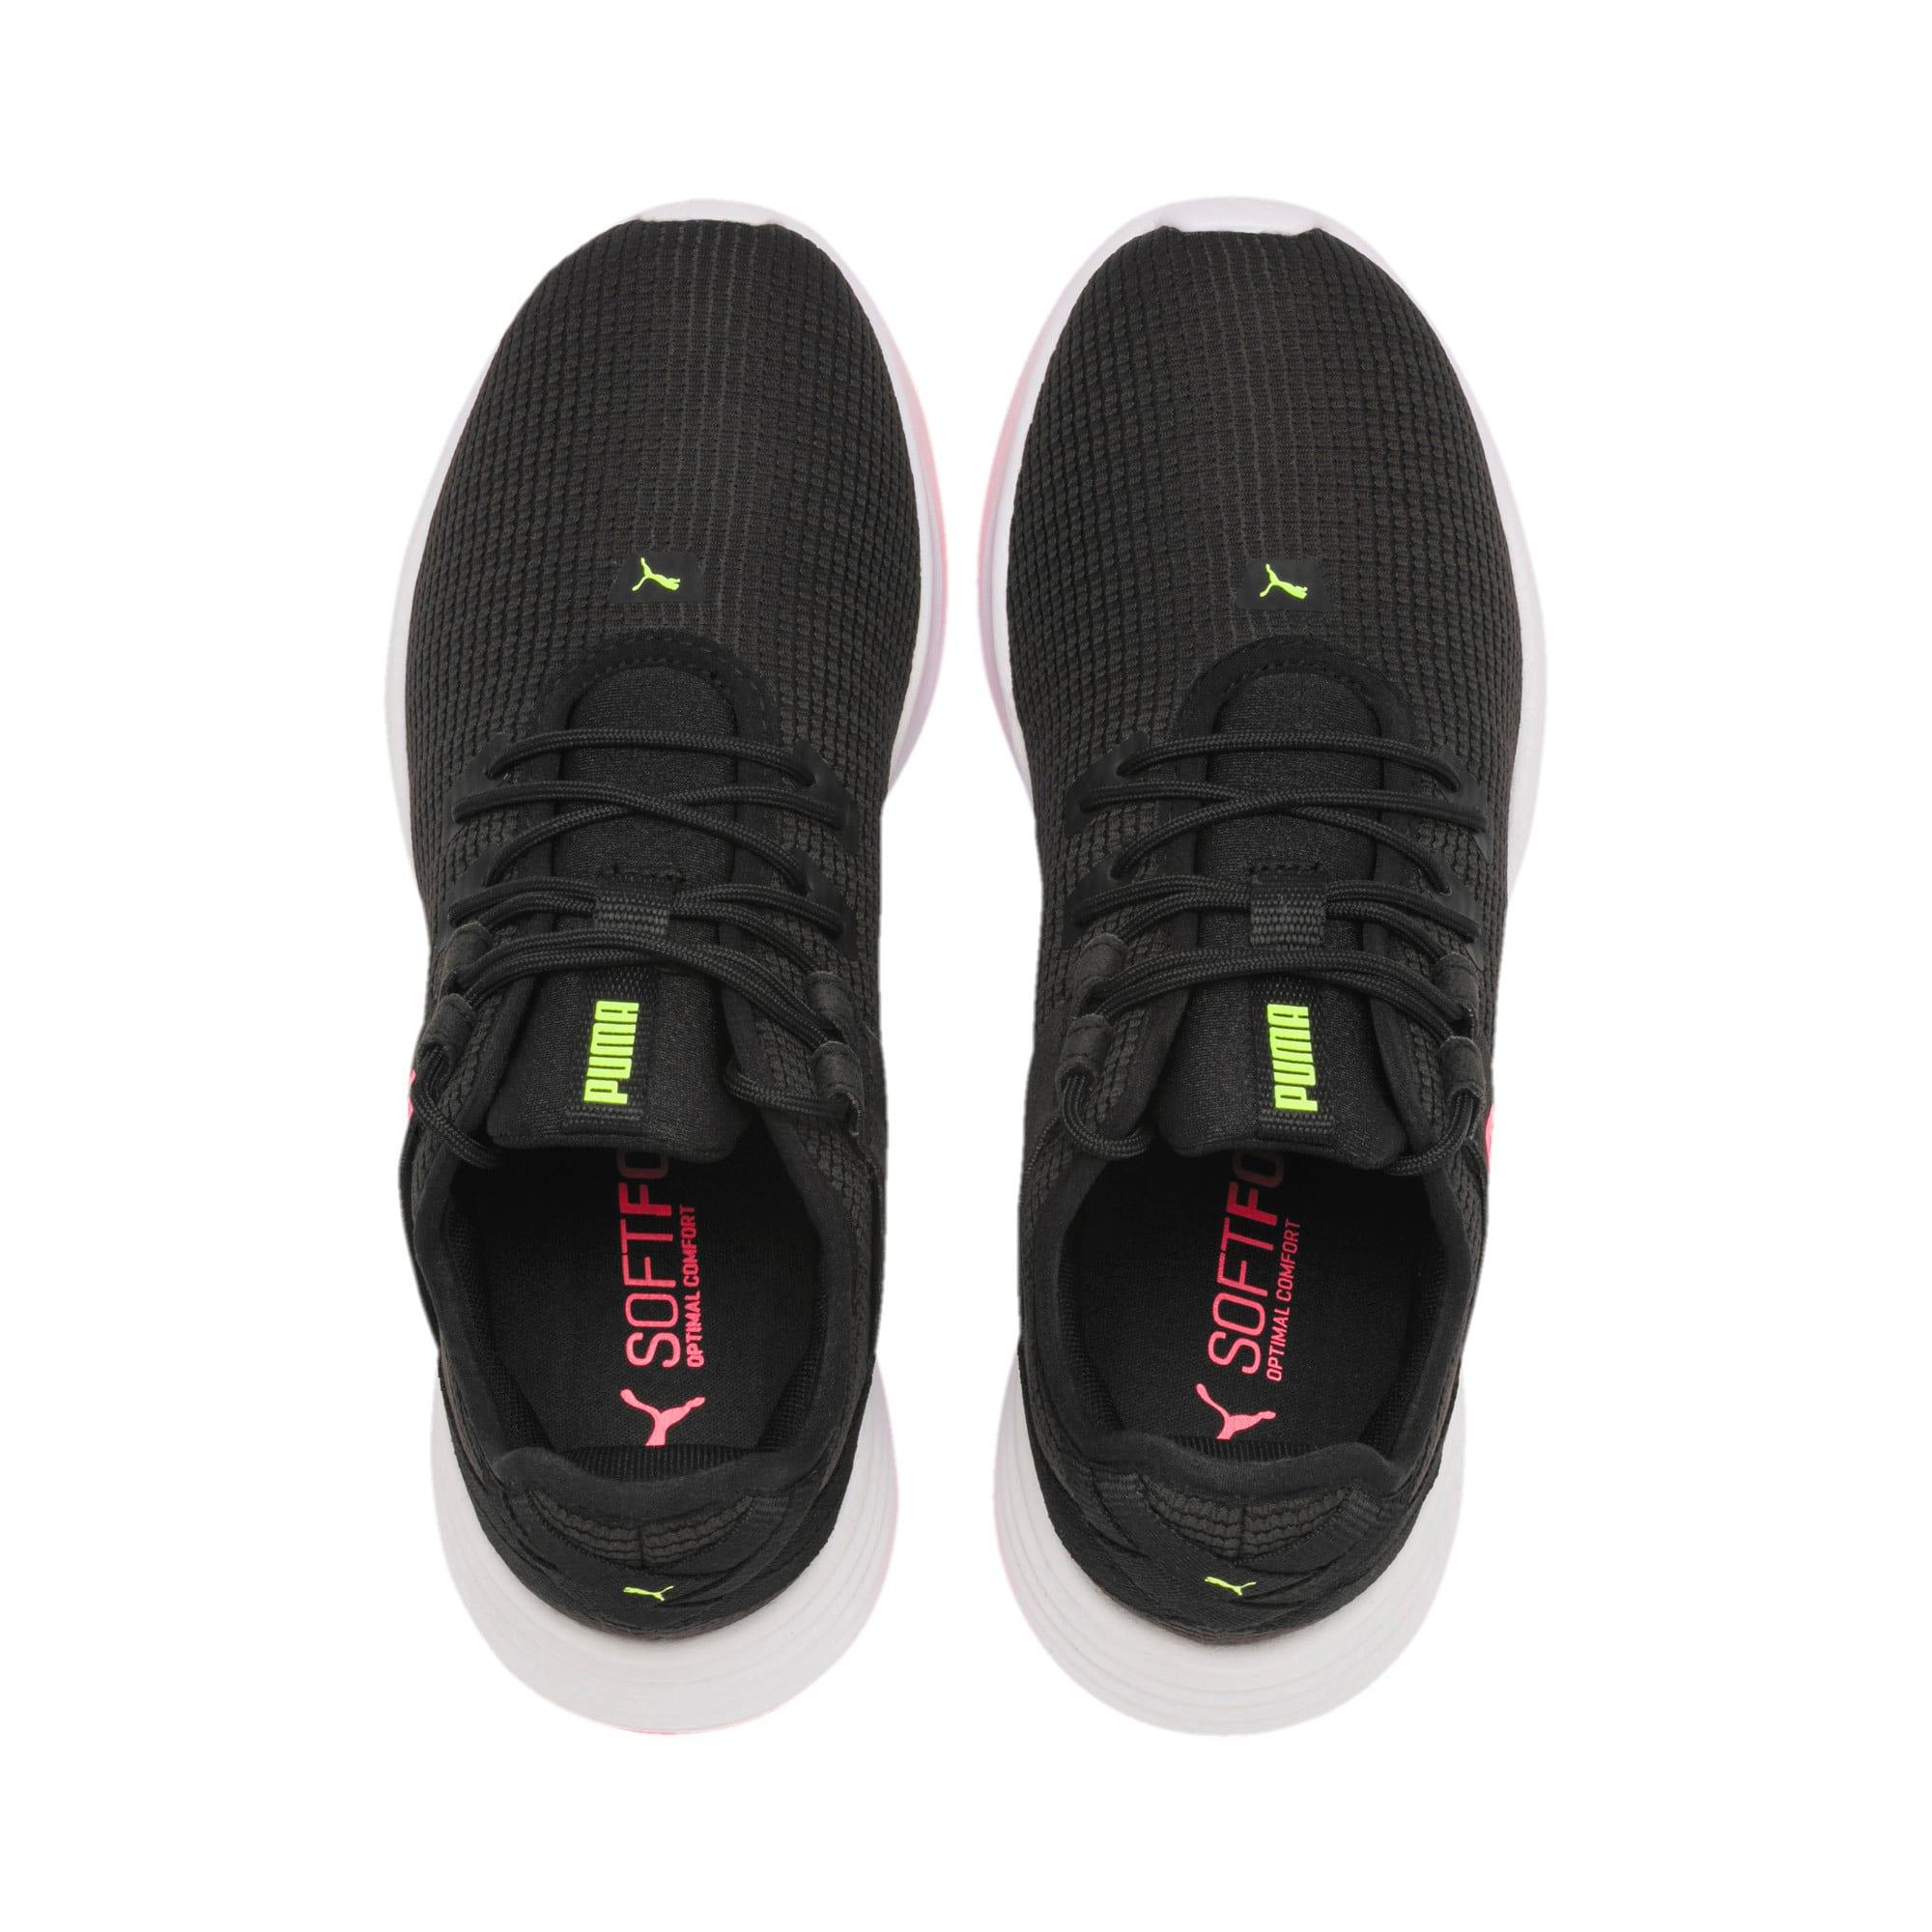 Thumbnail 8 of Radiate XT Women's Training Sneakers, Puma Black-Pink Alert, medium-IND